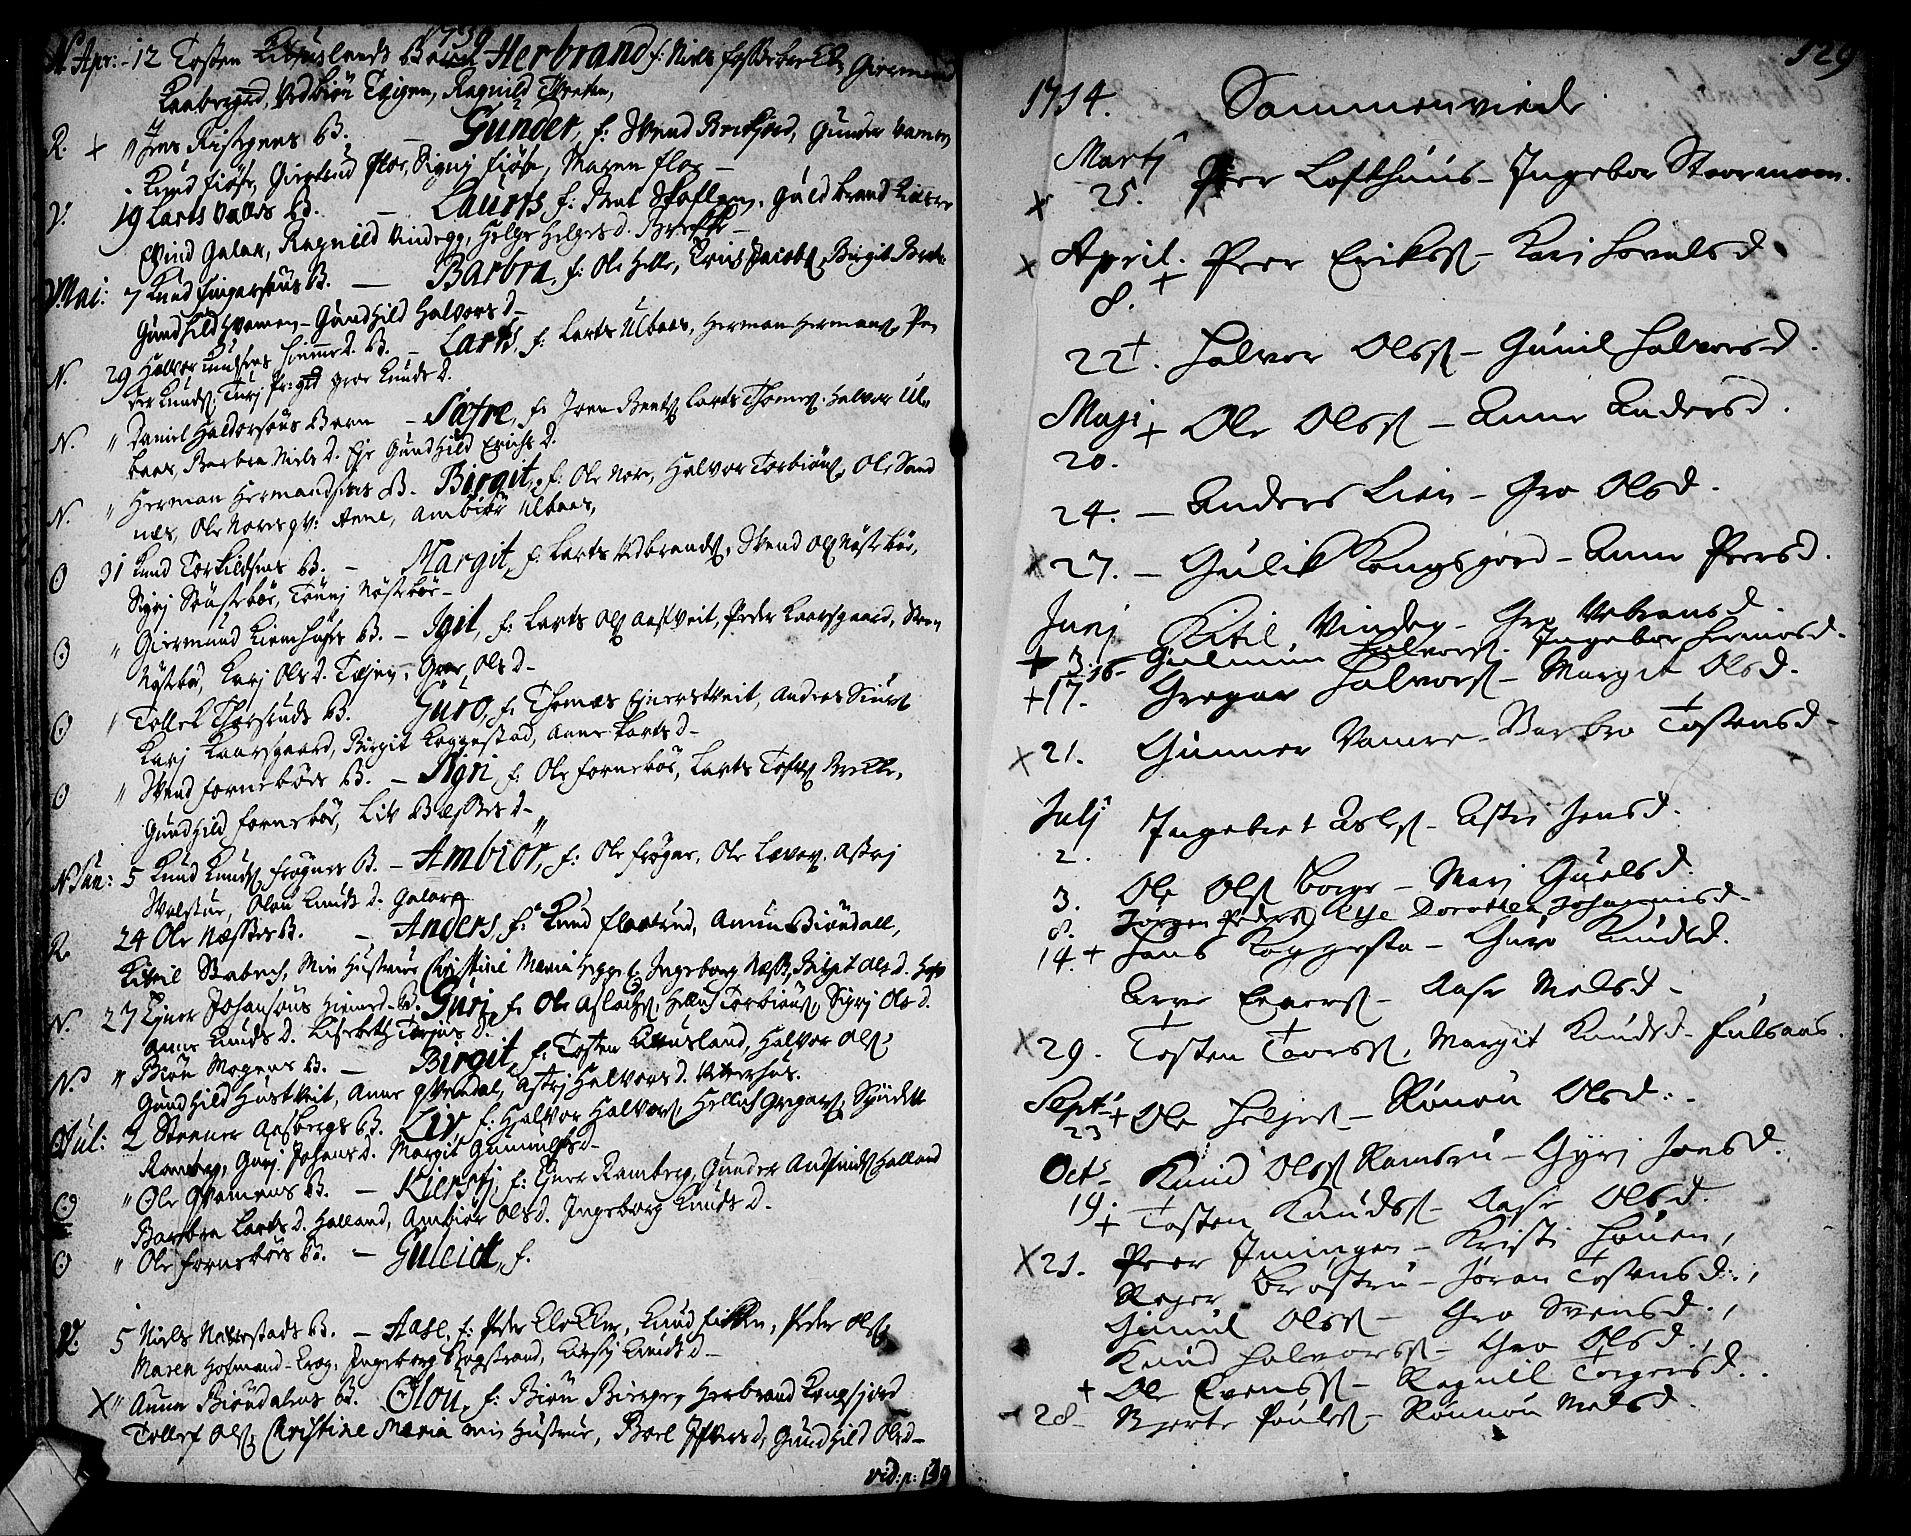 SAKO, Rollag kirkebøker, F/Fa/L0002: Ministerialbok nr. I 2, 1714-1742, s. 129